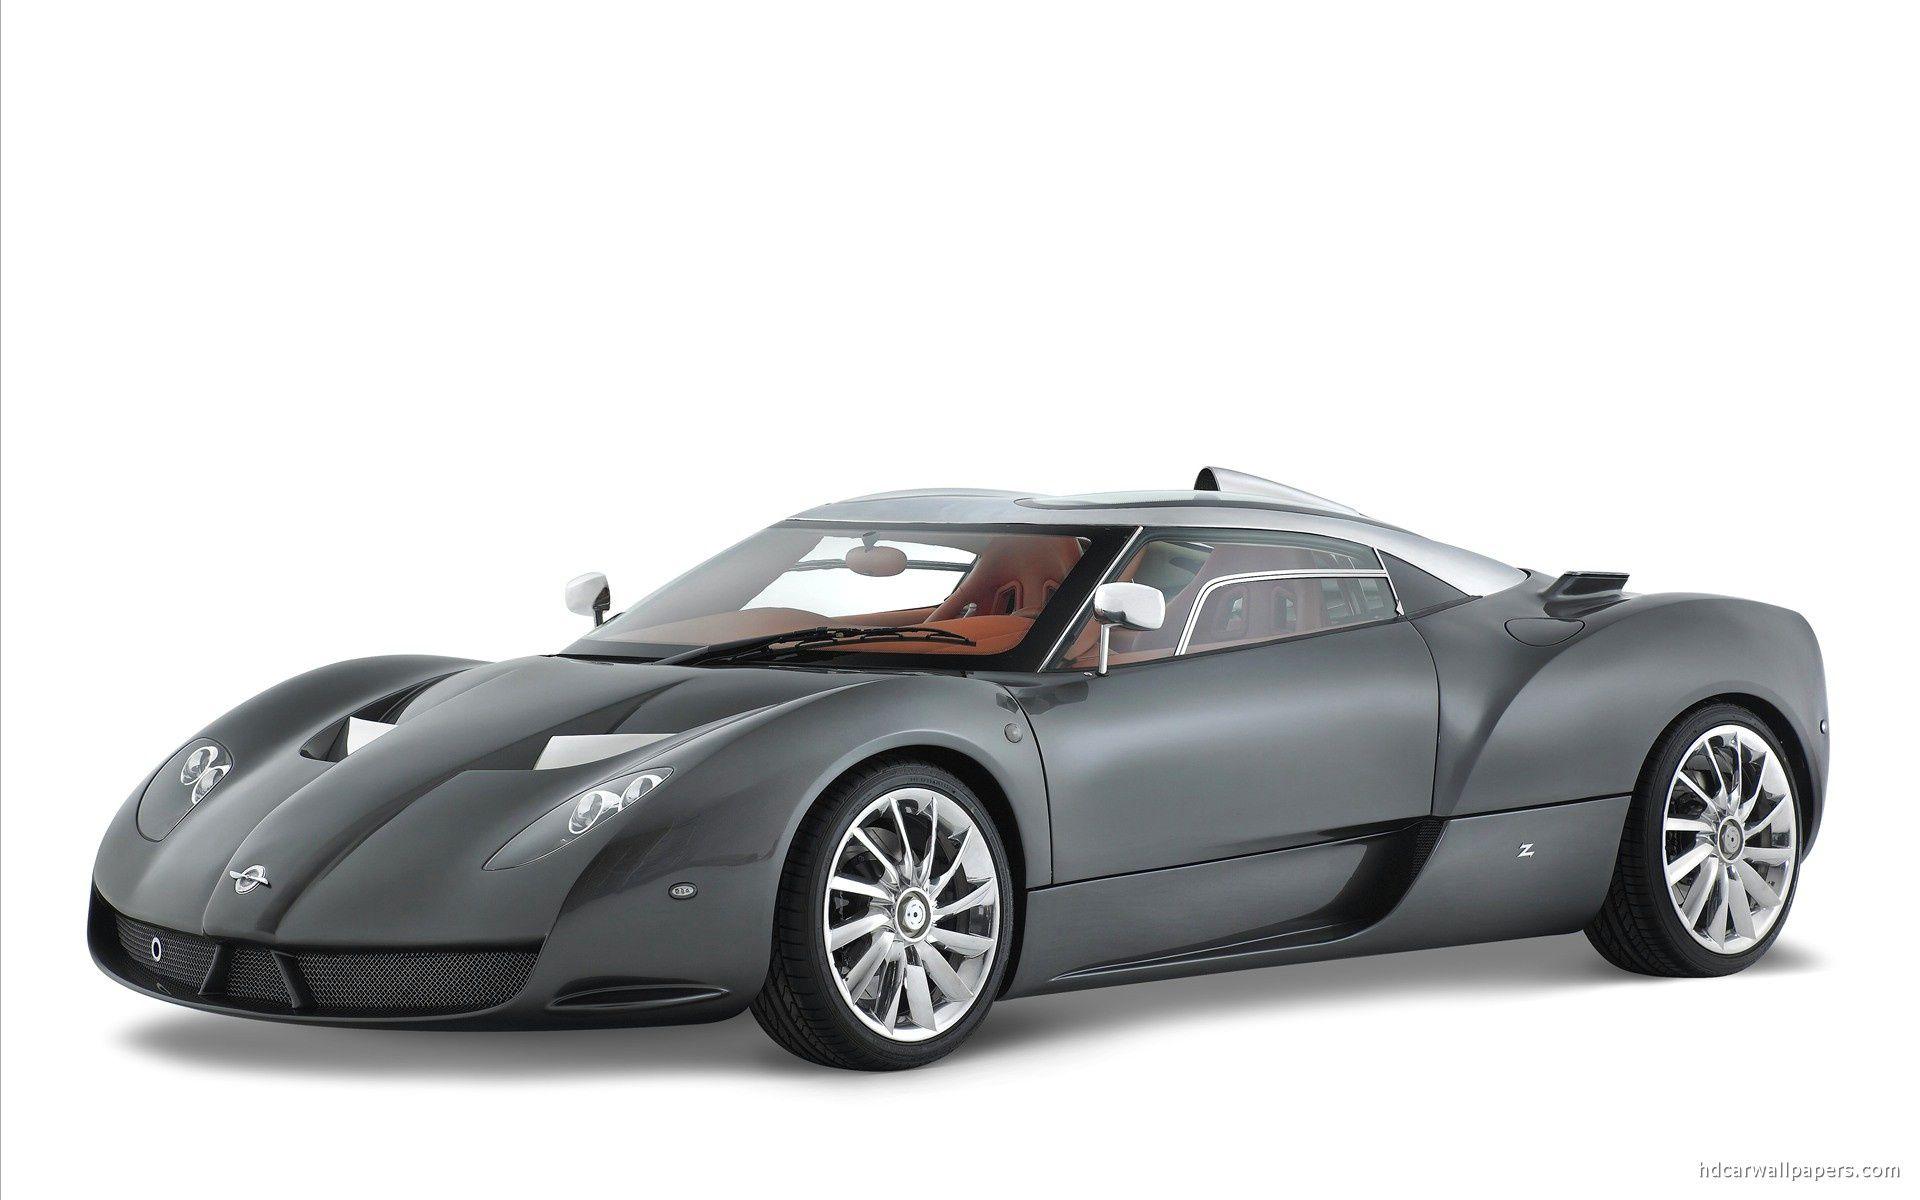 Black Spyker C12 Zagato Dream Cars Cars